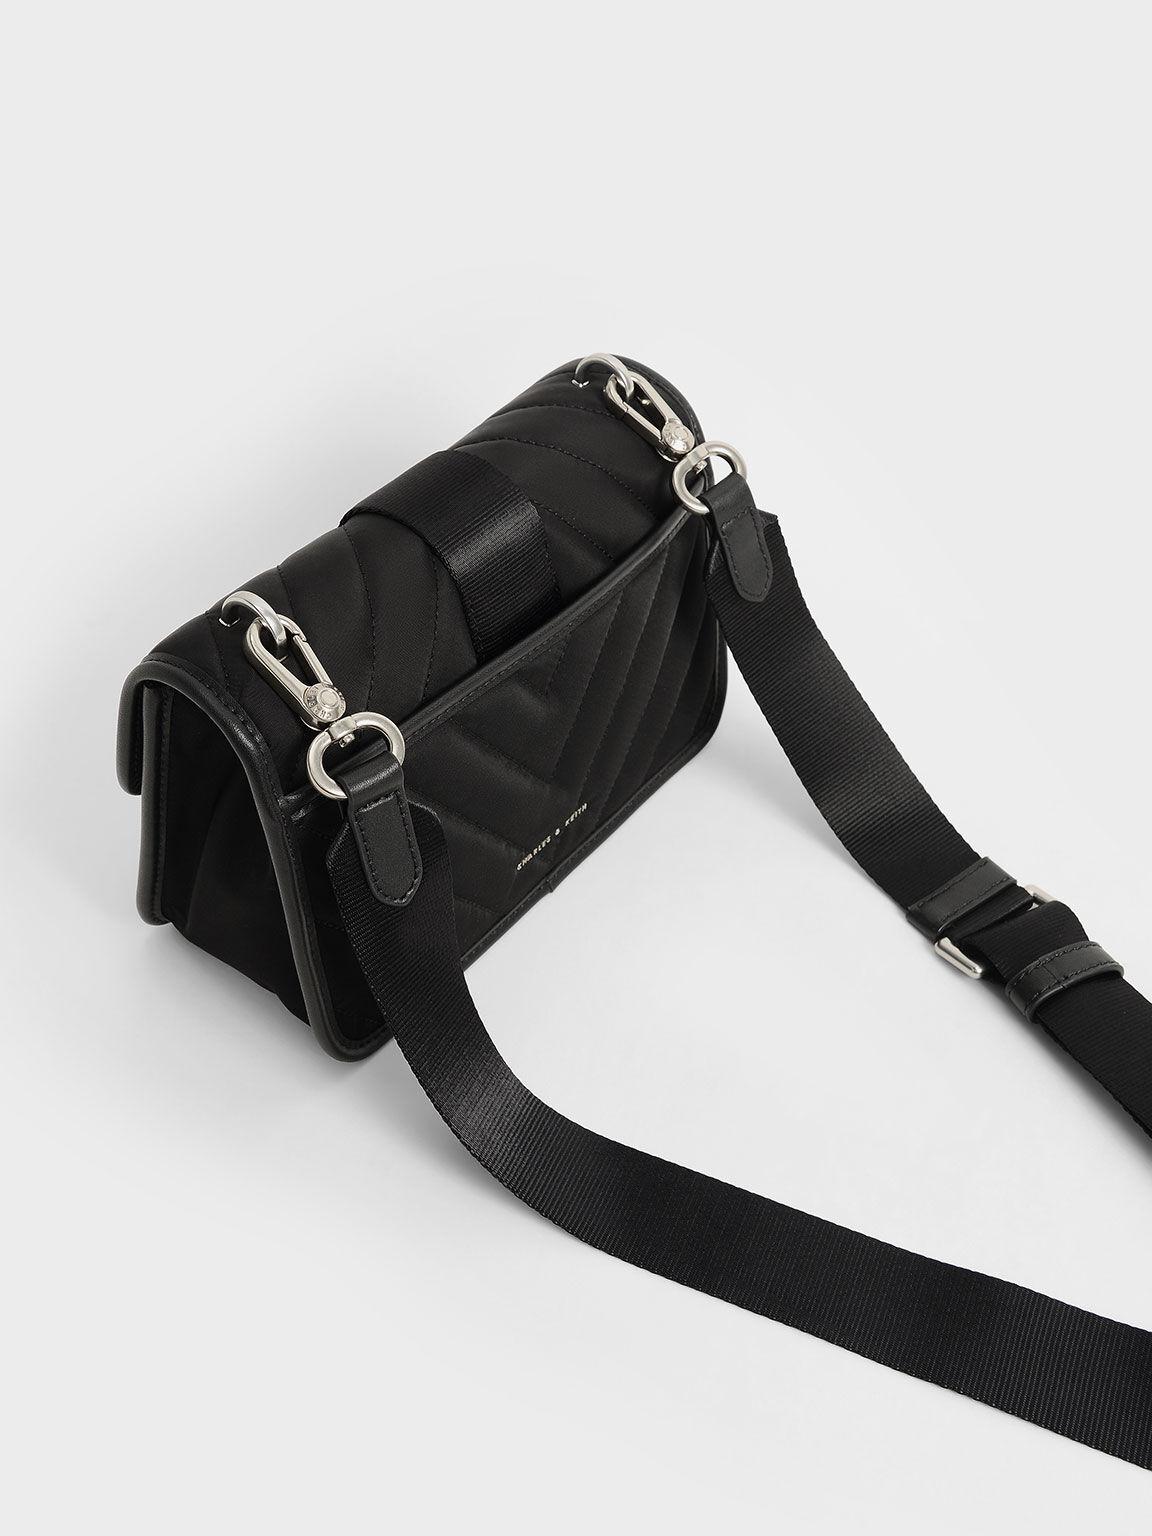 The Anniversary Series: Sonia Recycled Nylon Padded Bag, Black, hi-res